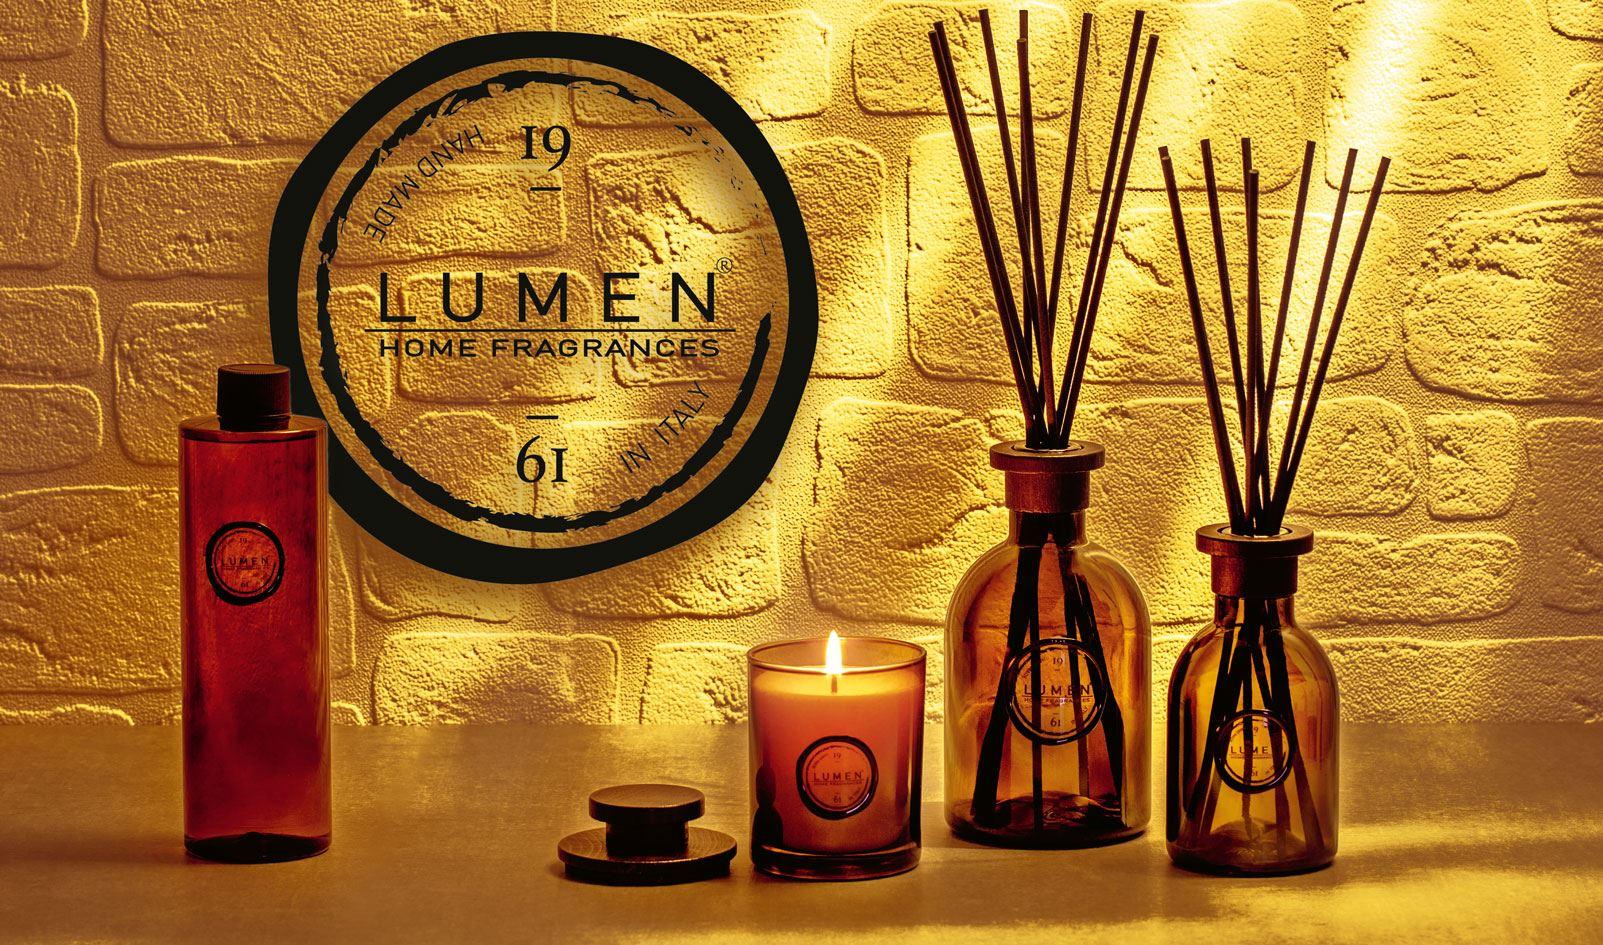 Herbalist Lumen 19-61